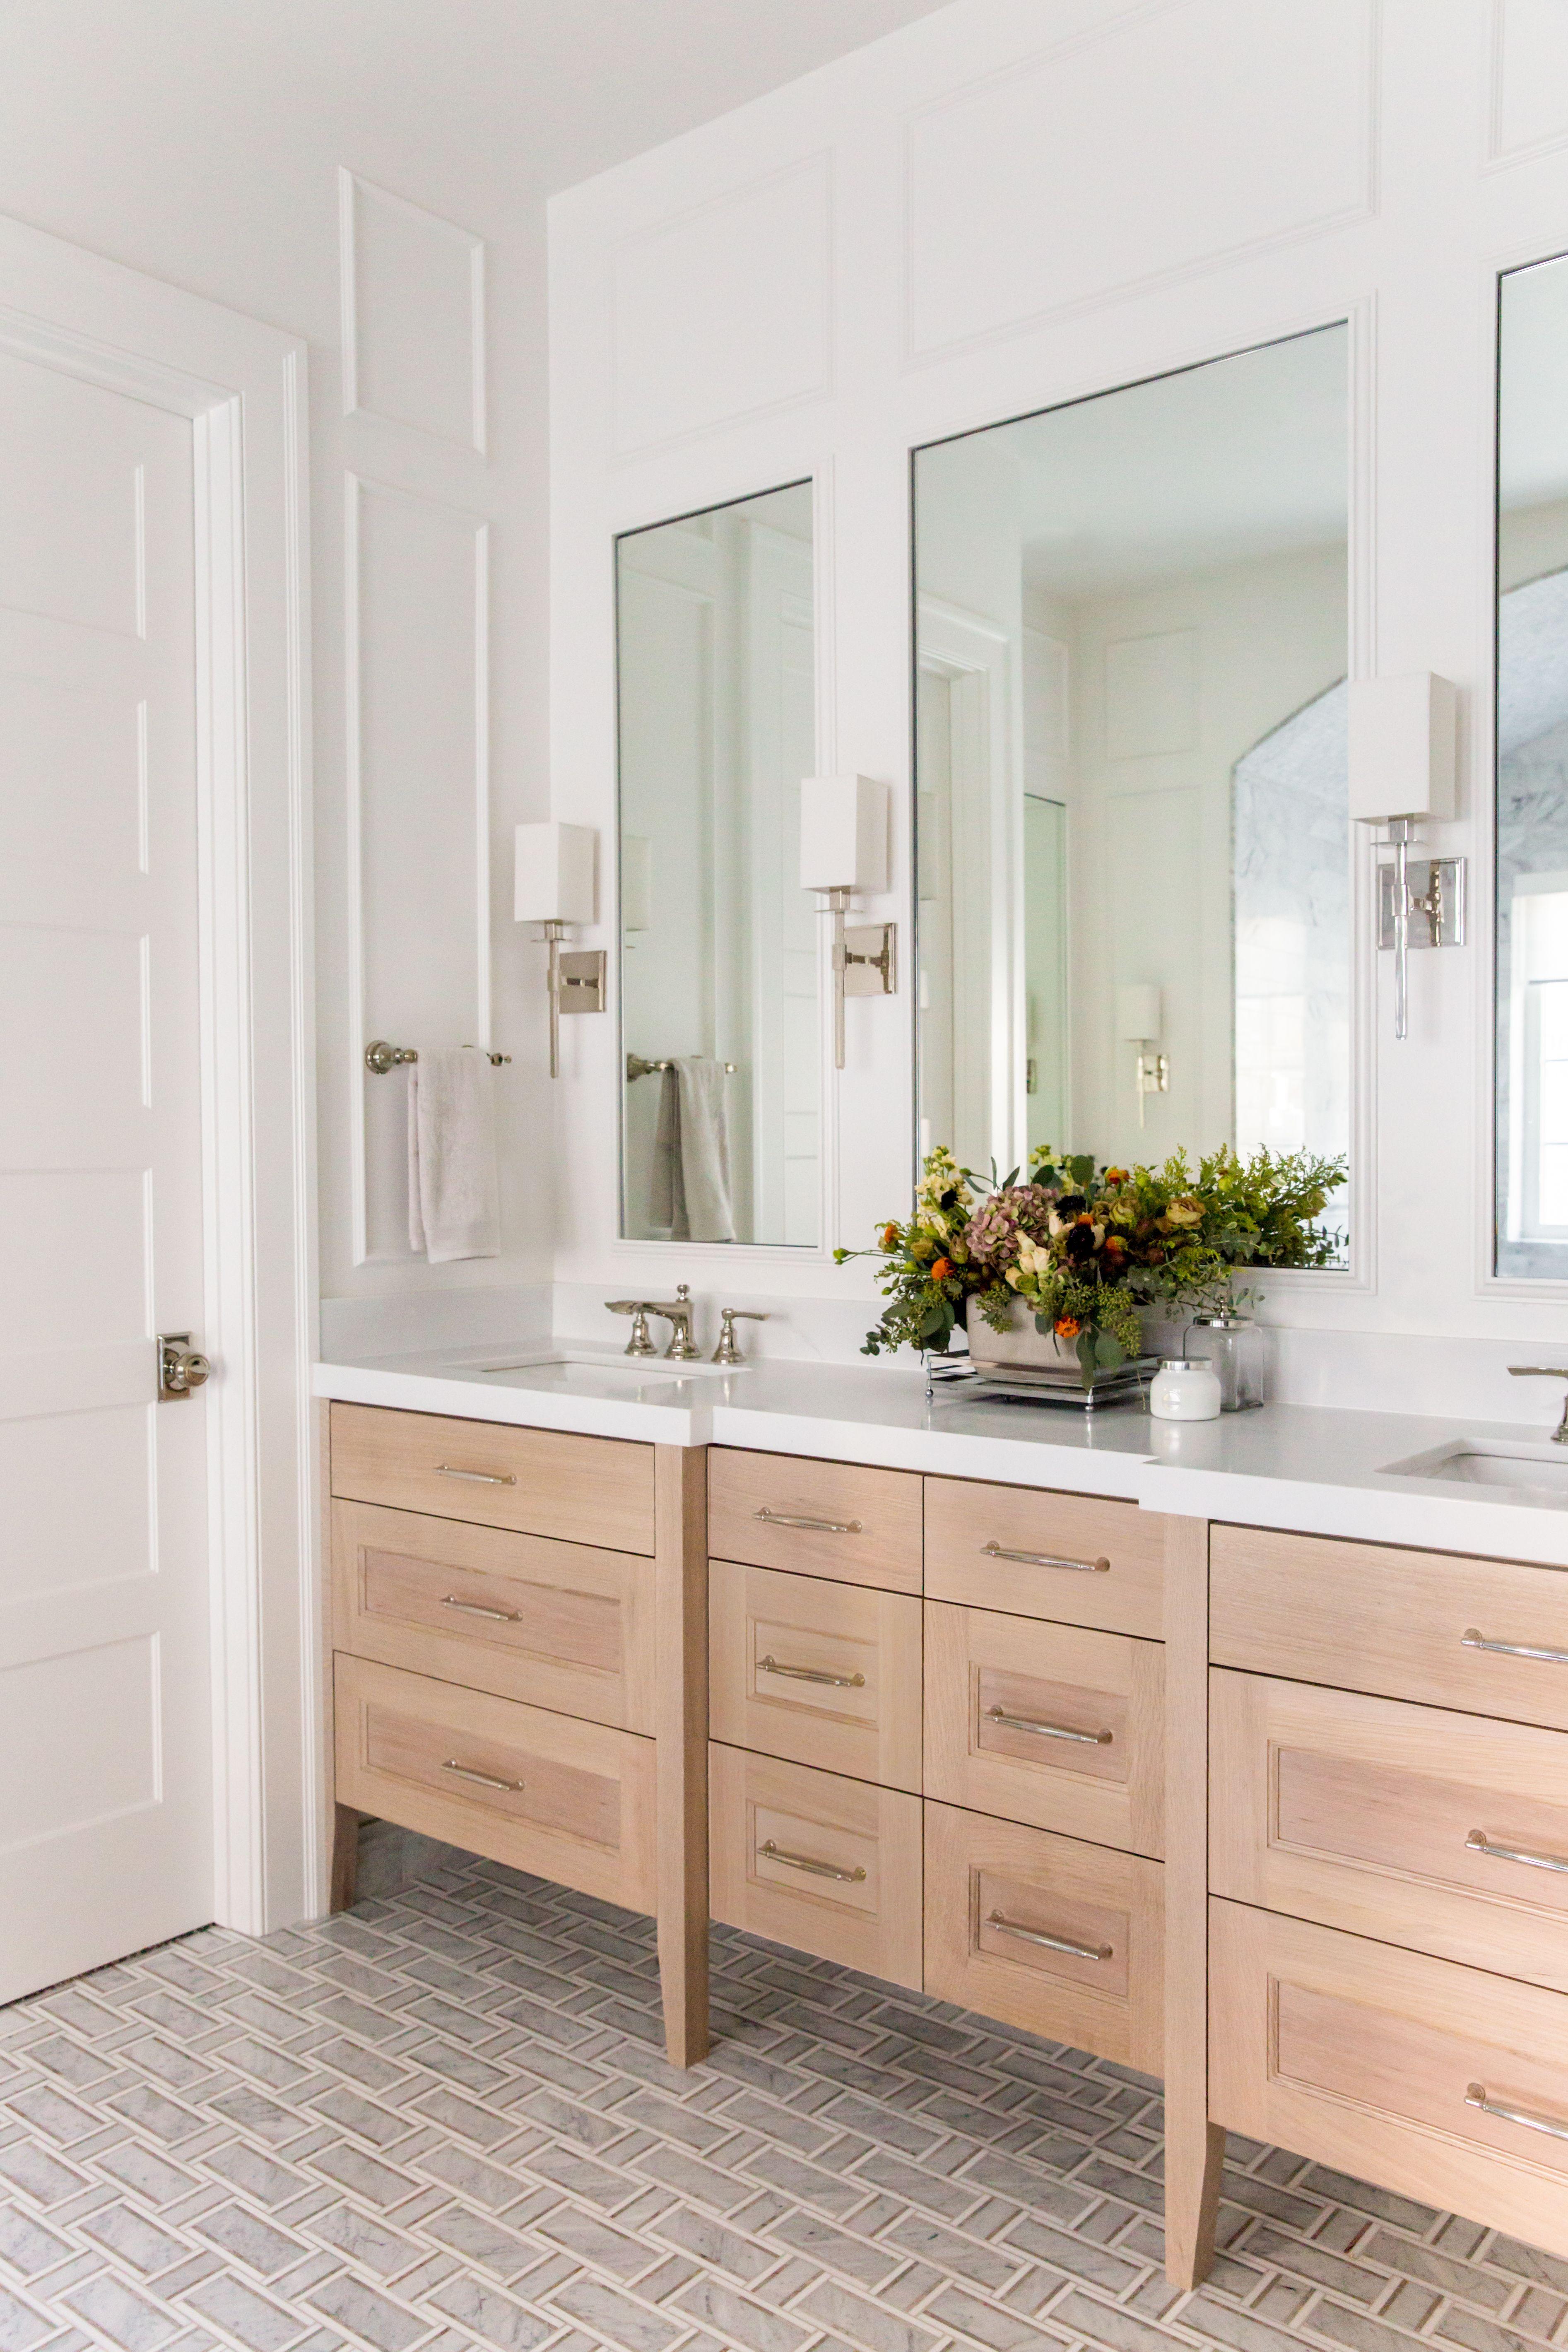 The Smi Inland Coastal Master Bathroom Reveal Sita Montgomery Interiors Master Bathroom Vanity Modern Master Bathroom Bathroom Design